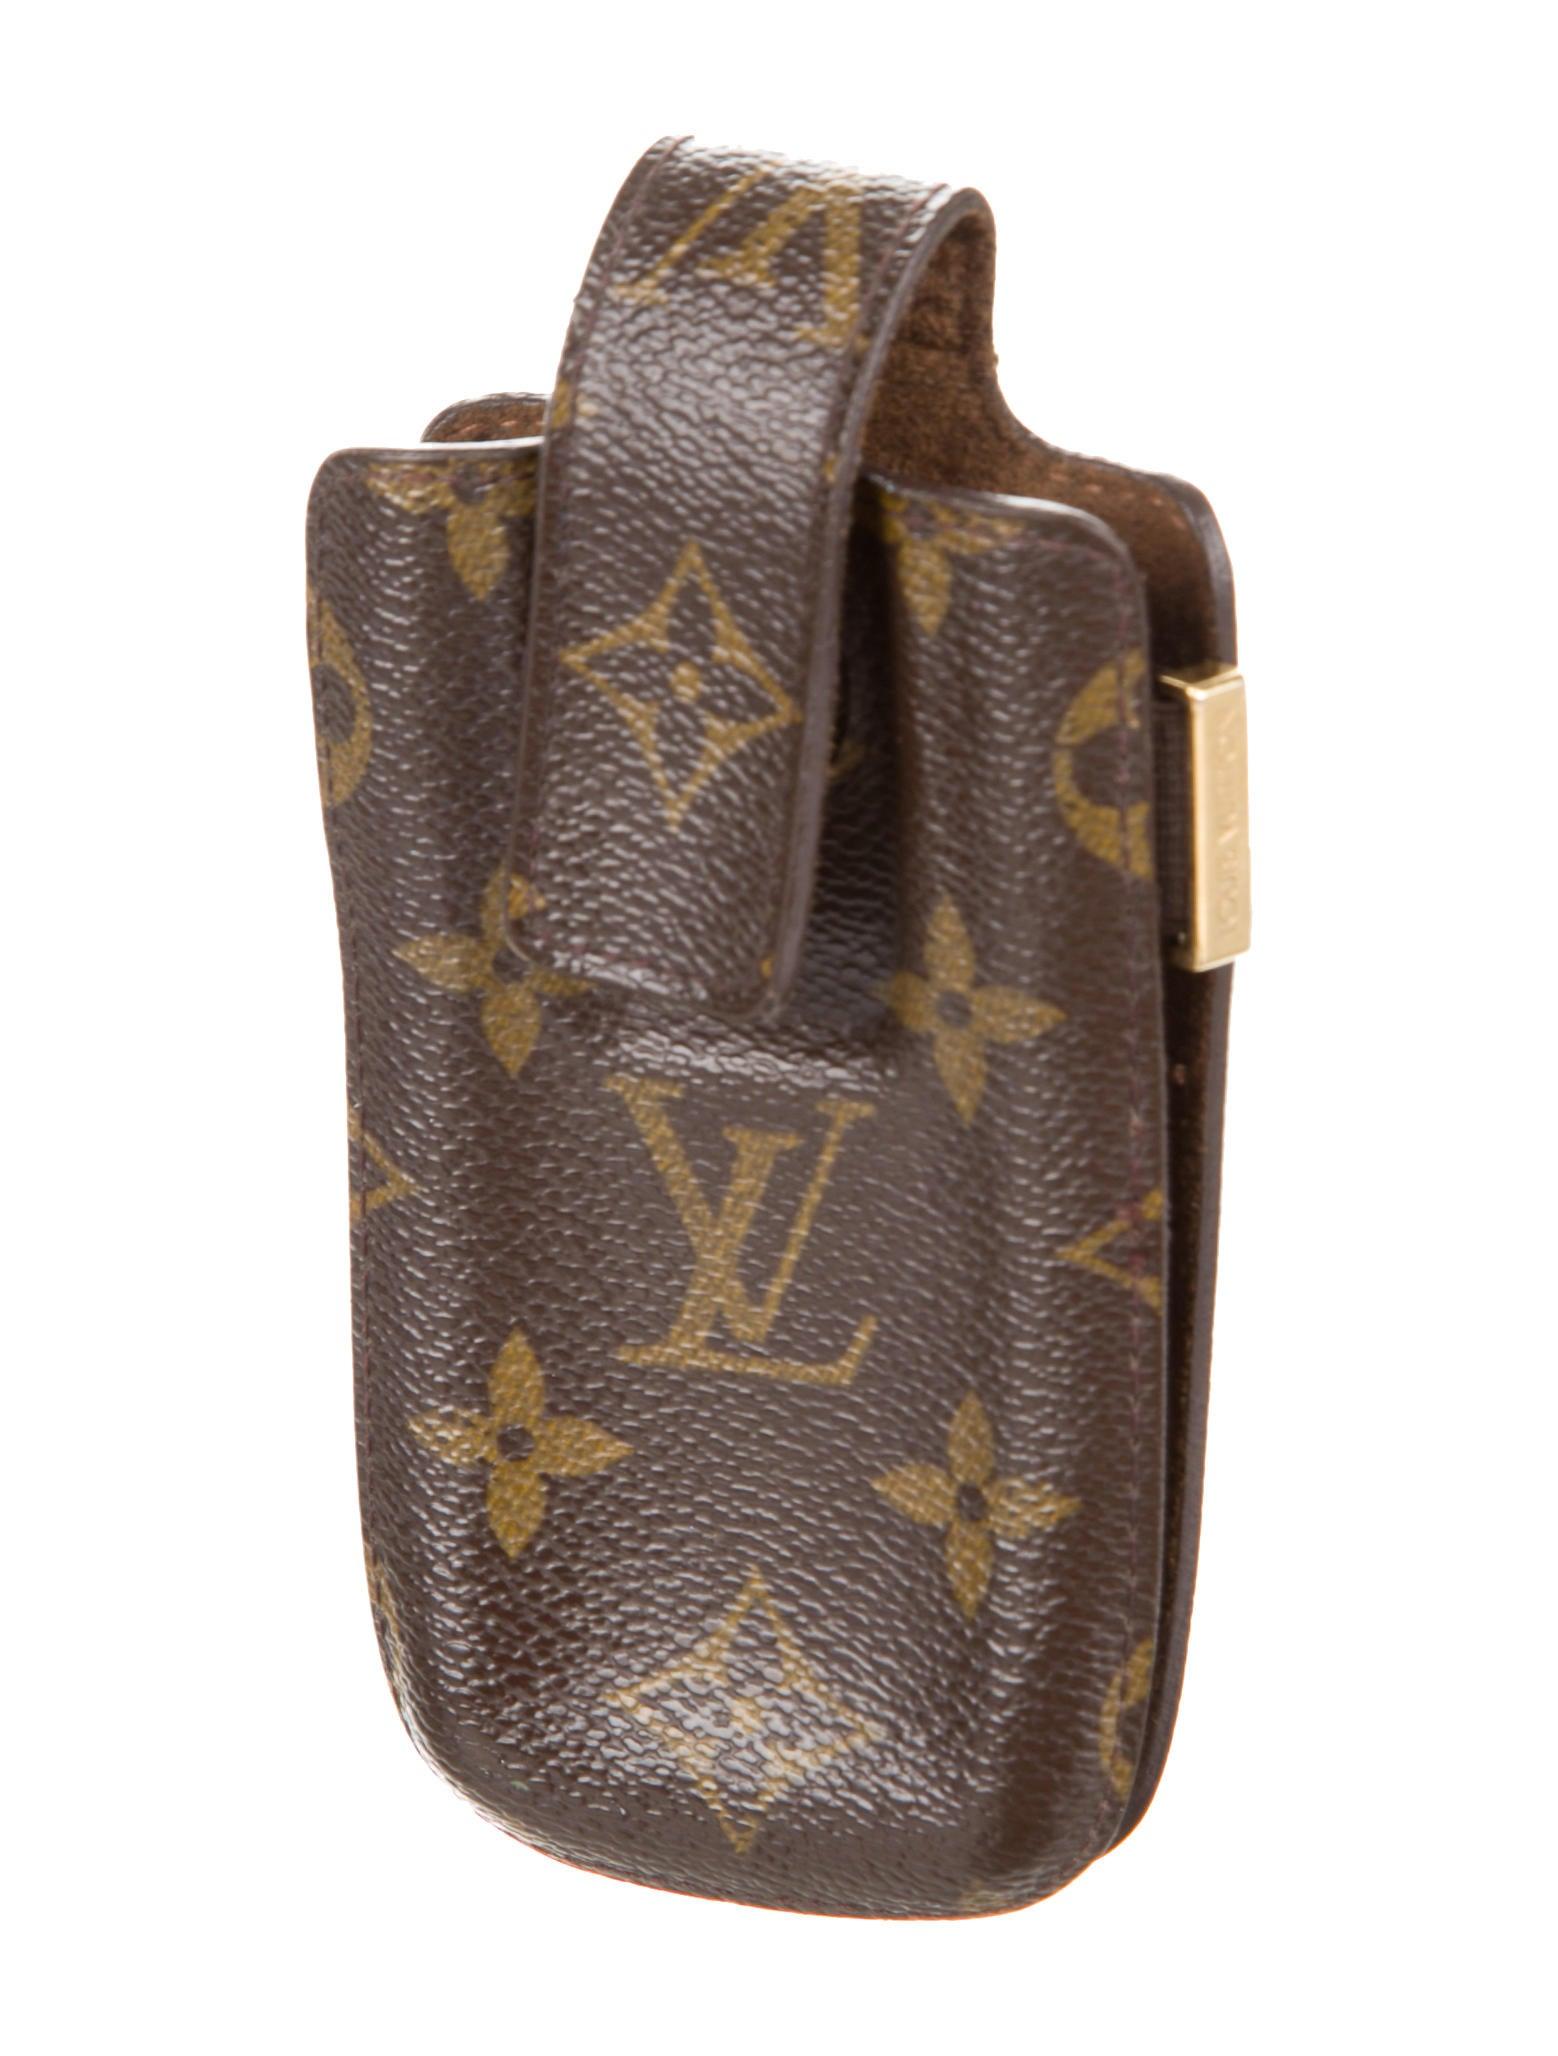 Louis Vuitton Monogram Phone Case - Accessories - LOU111205  The RealReal